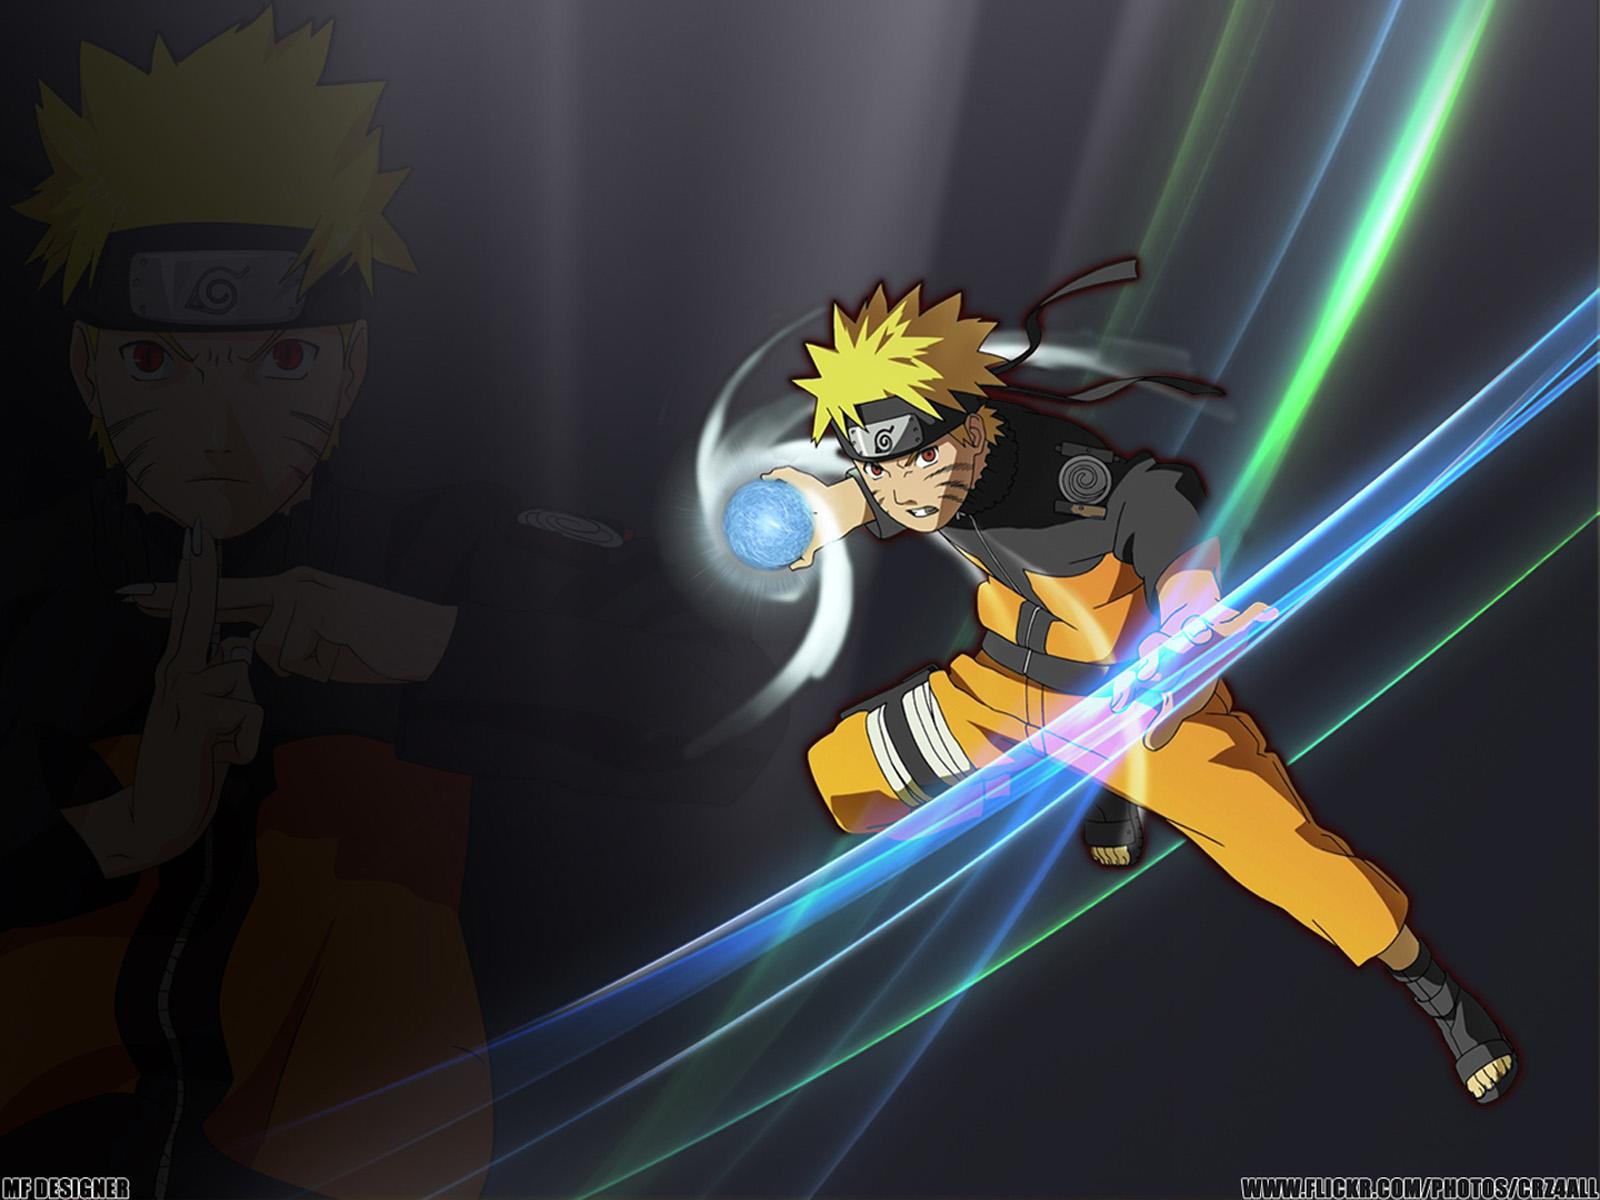 Imagenes HD de Naruto y Naruto Shippuden descarga gratis   Todotegusta 1600x1200